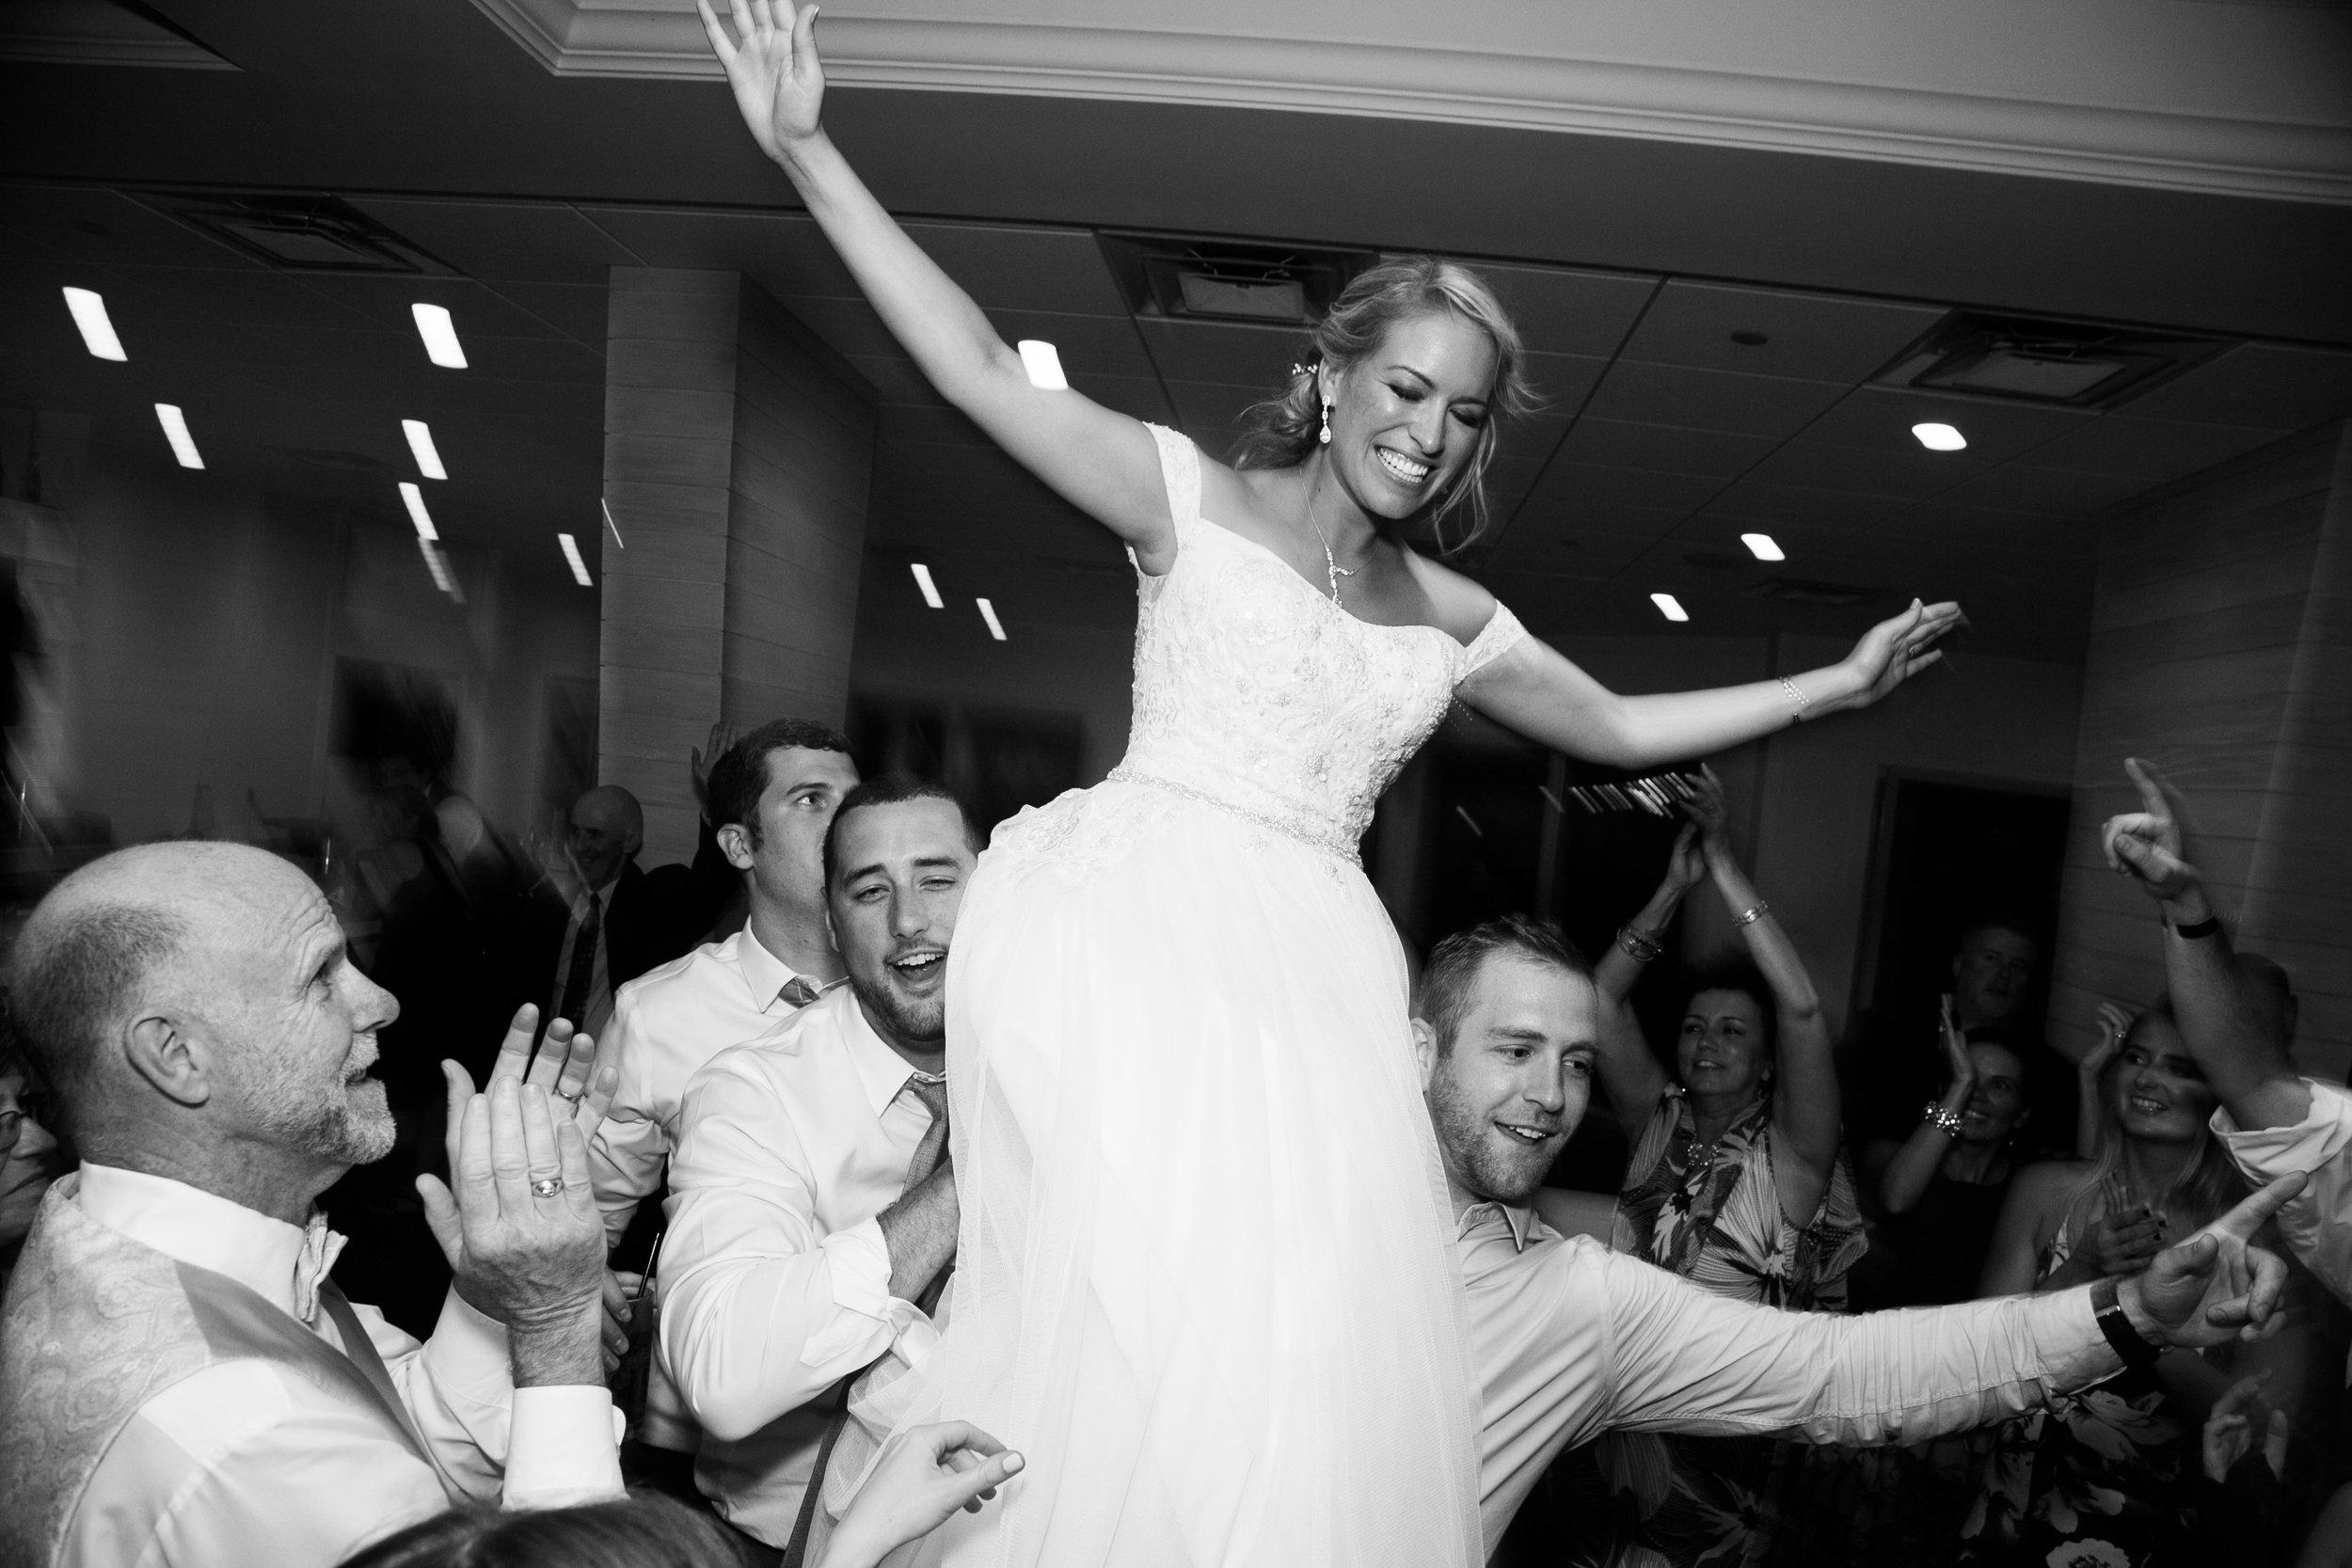 ICONA GOLDEN INN AVALON NJ WEDDING PHOTOGRAPHY  - 102.jpg